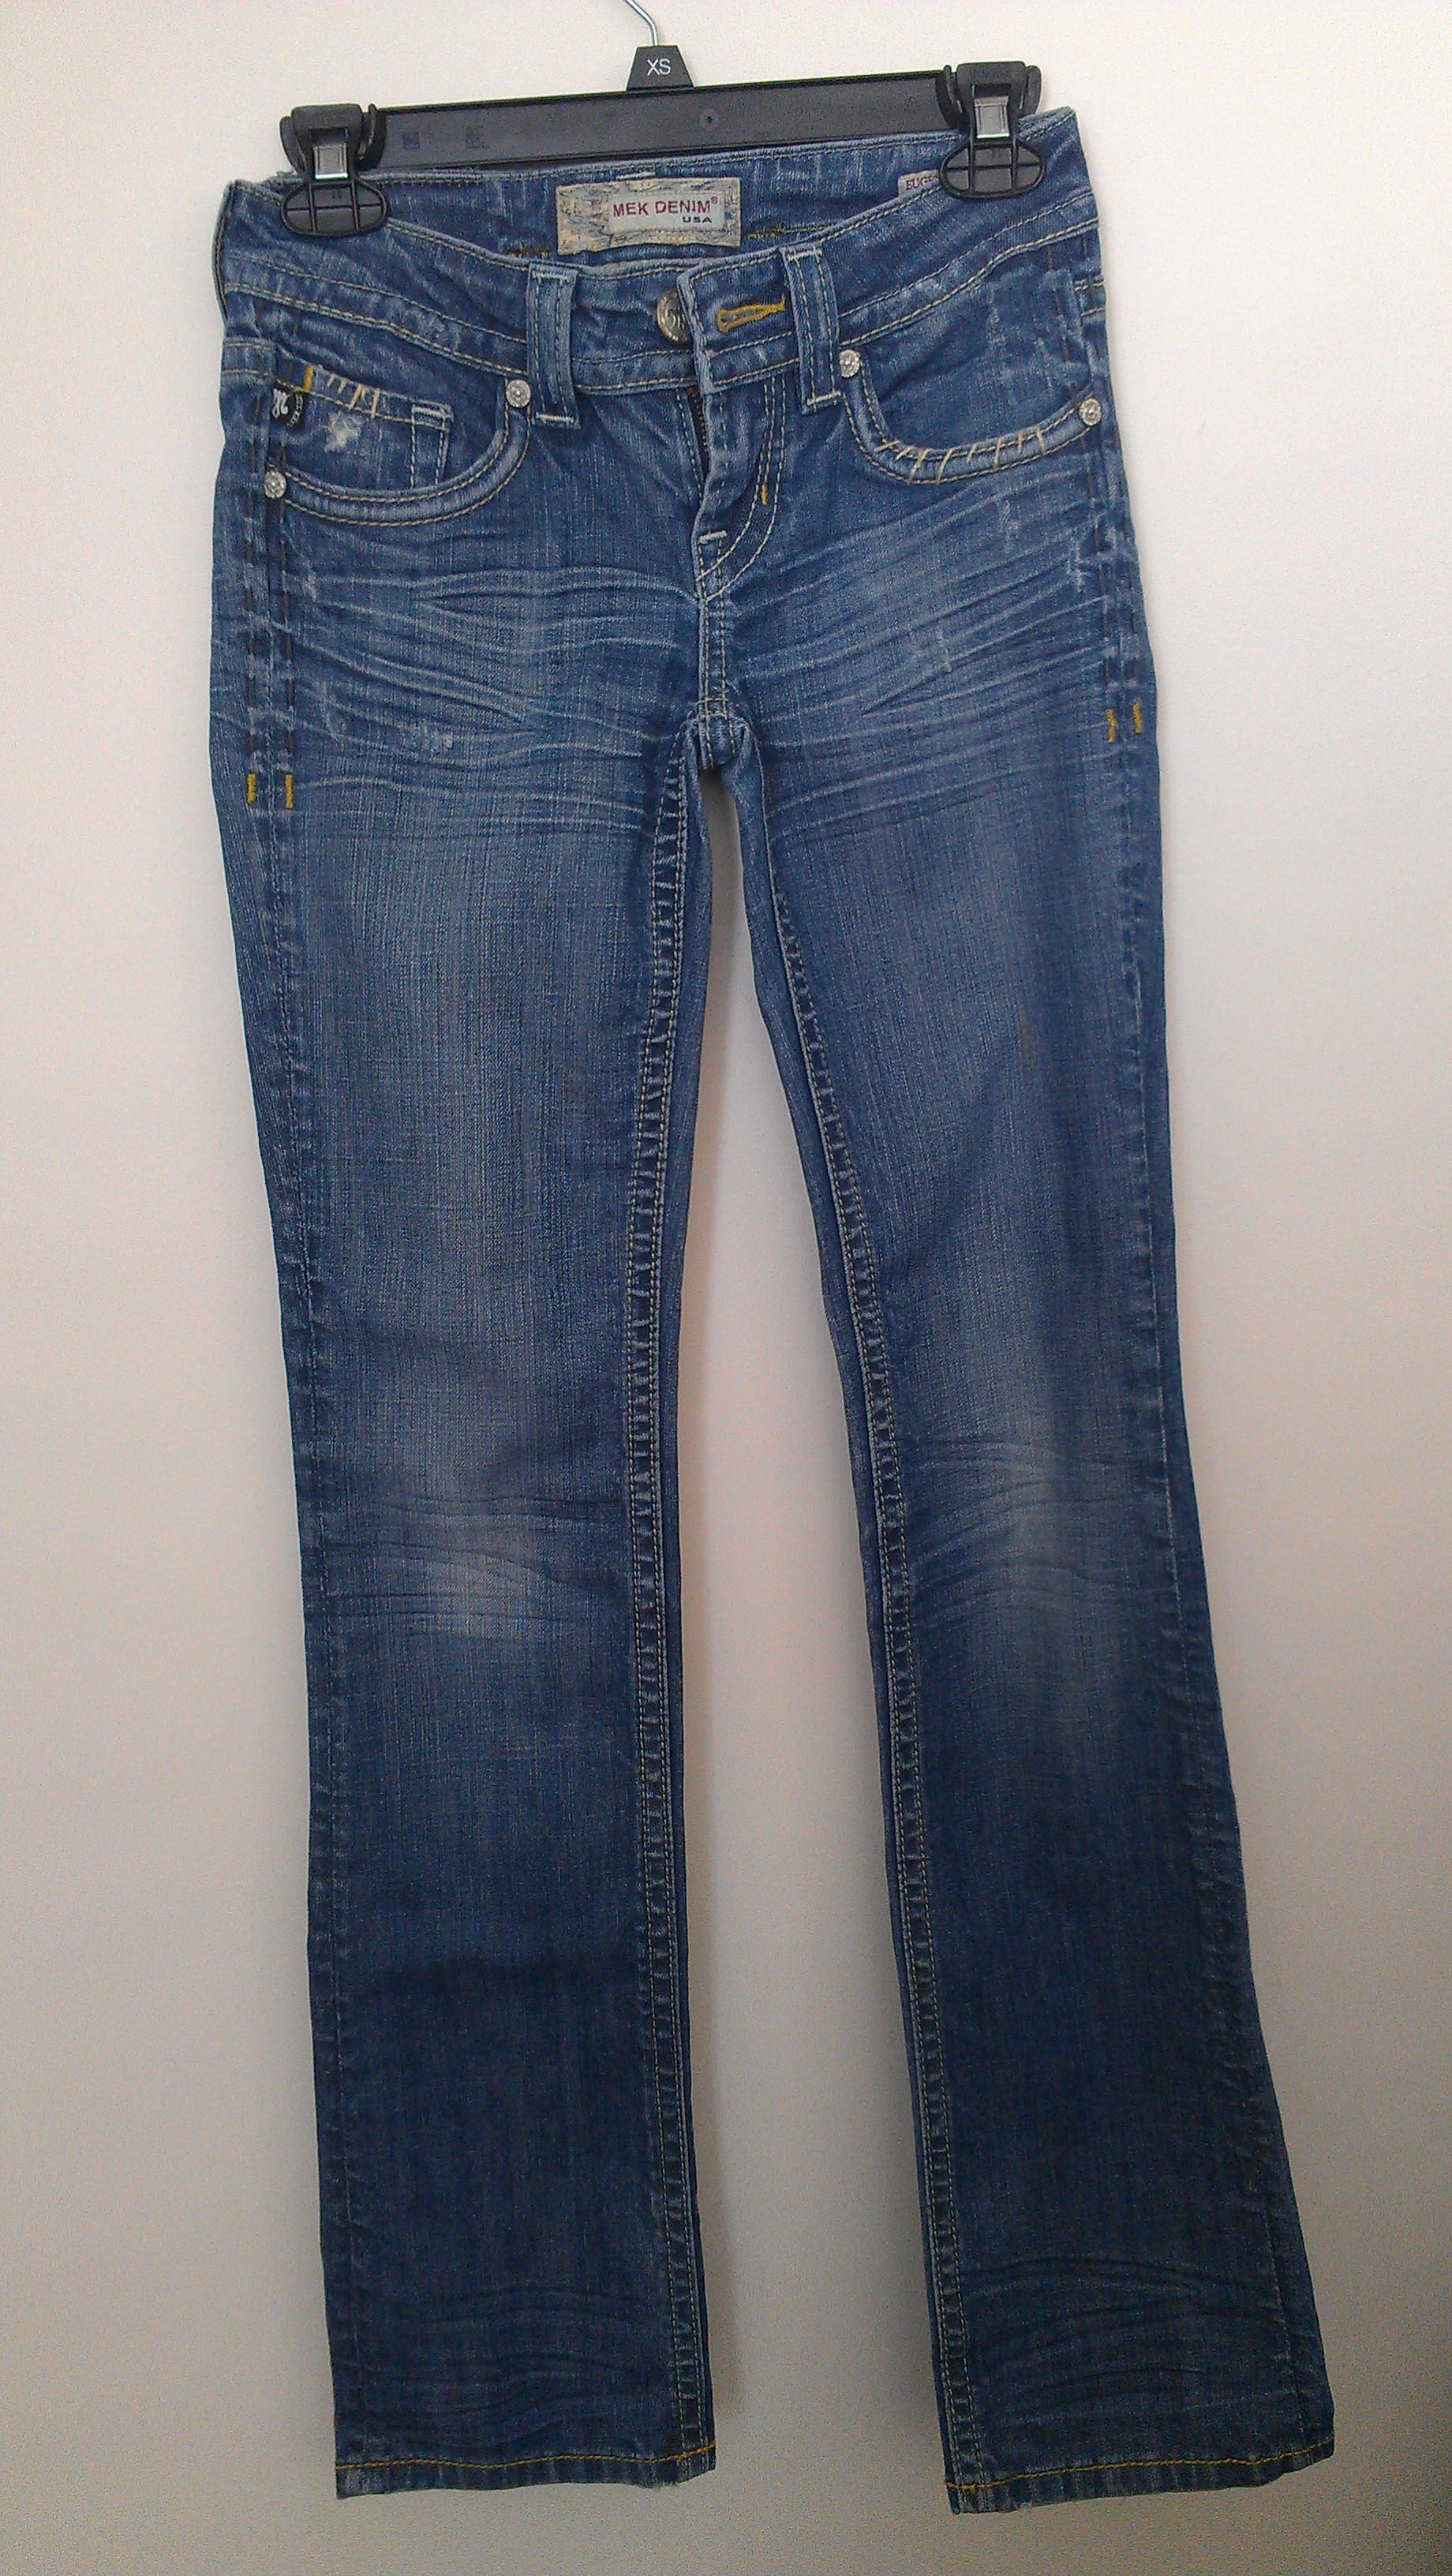 denim straight jeans mek cececouture online store. Black Bedroom Furniture Sets. Home Design Ideas